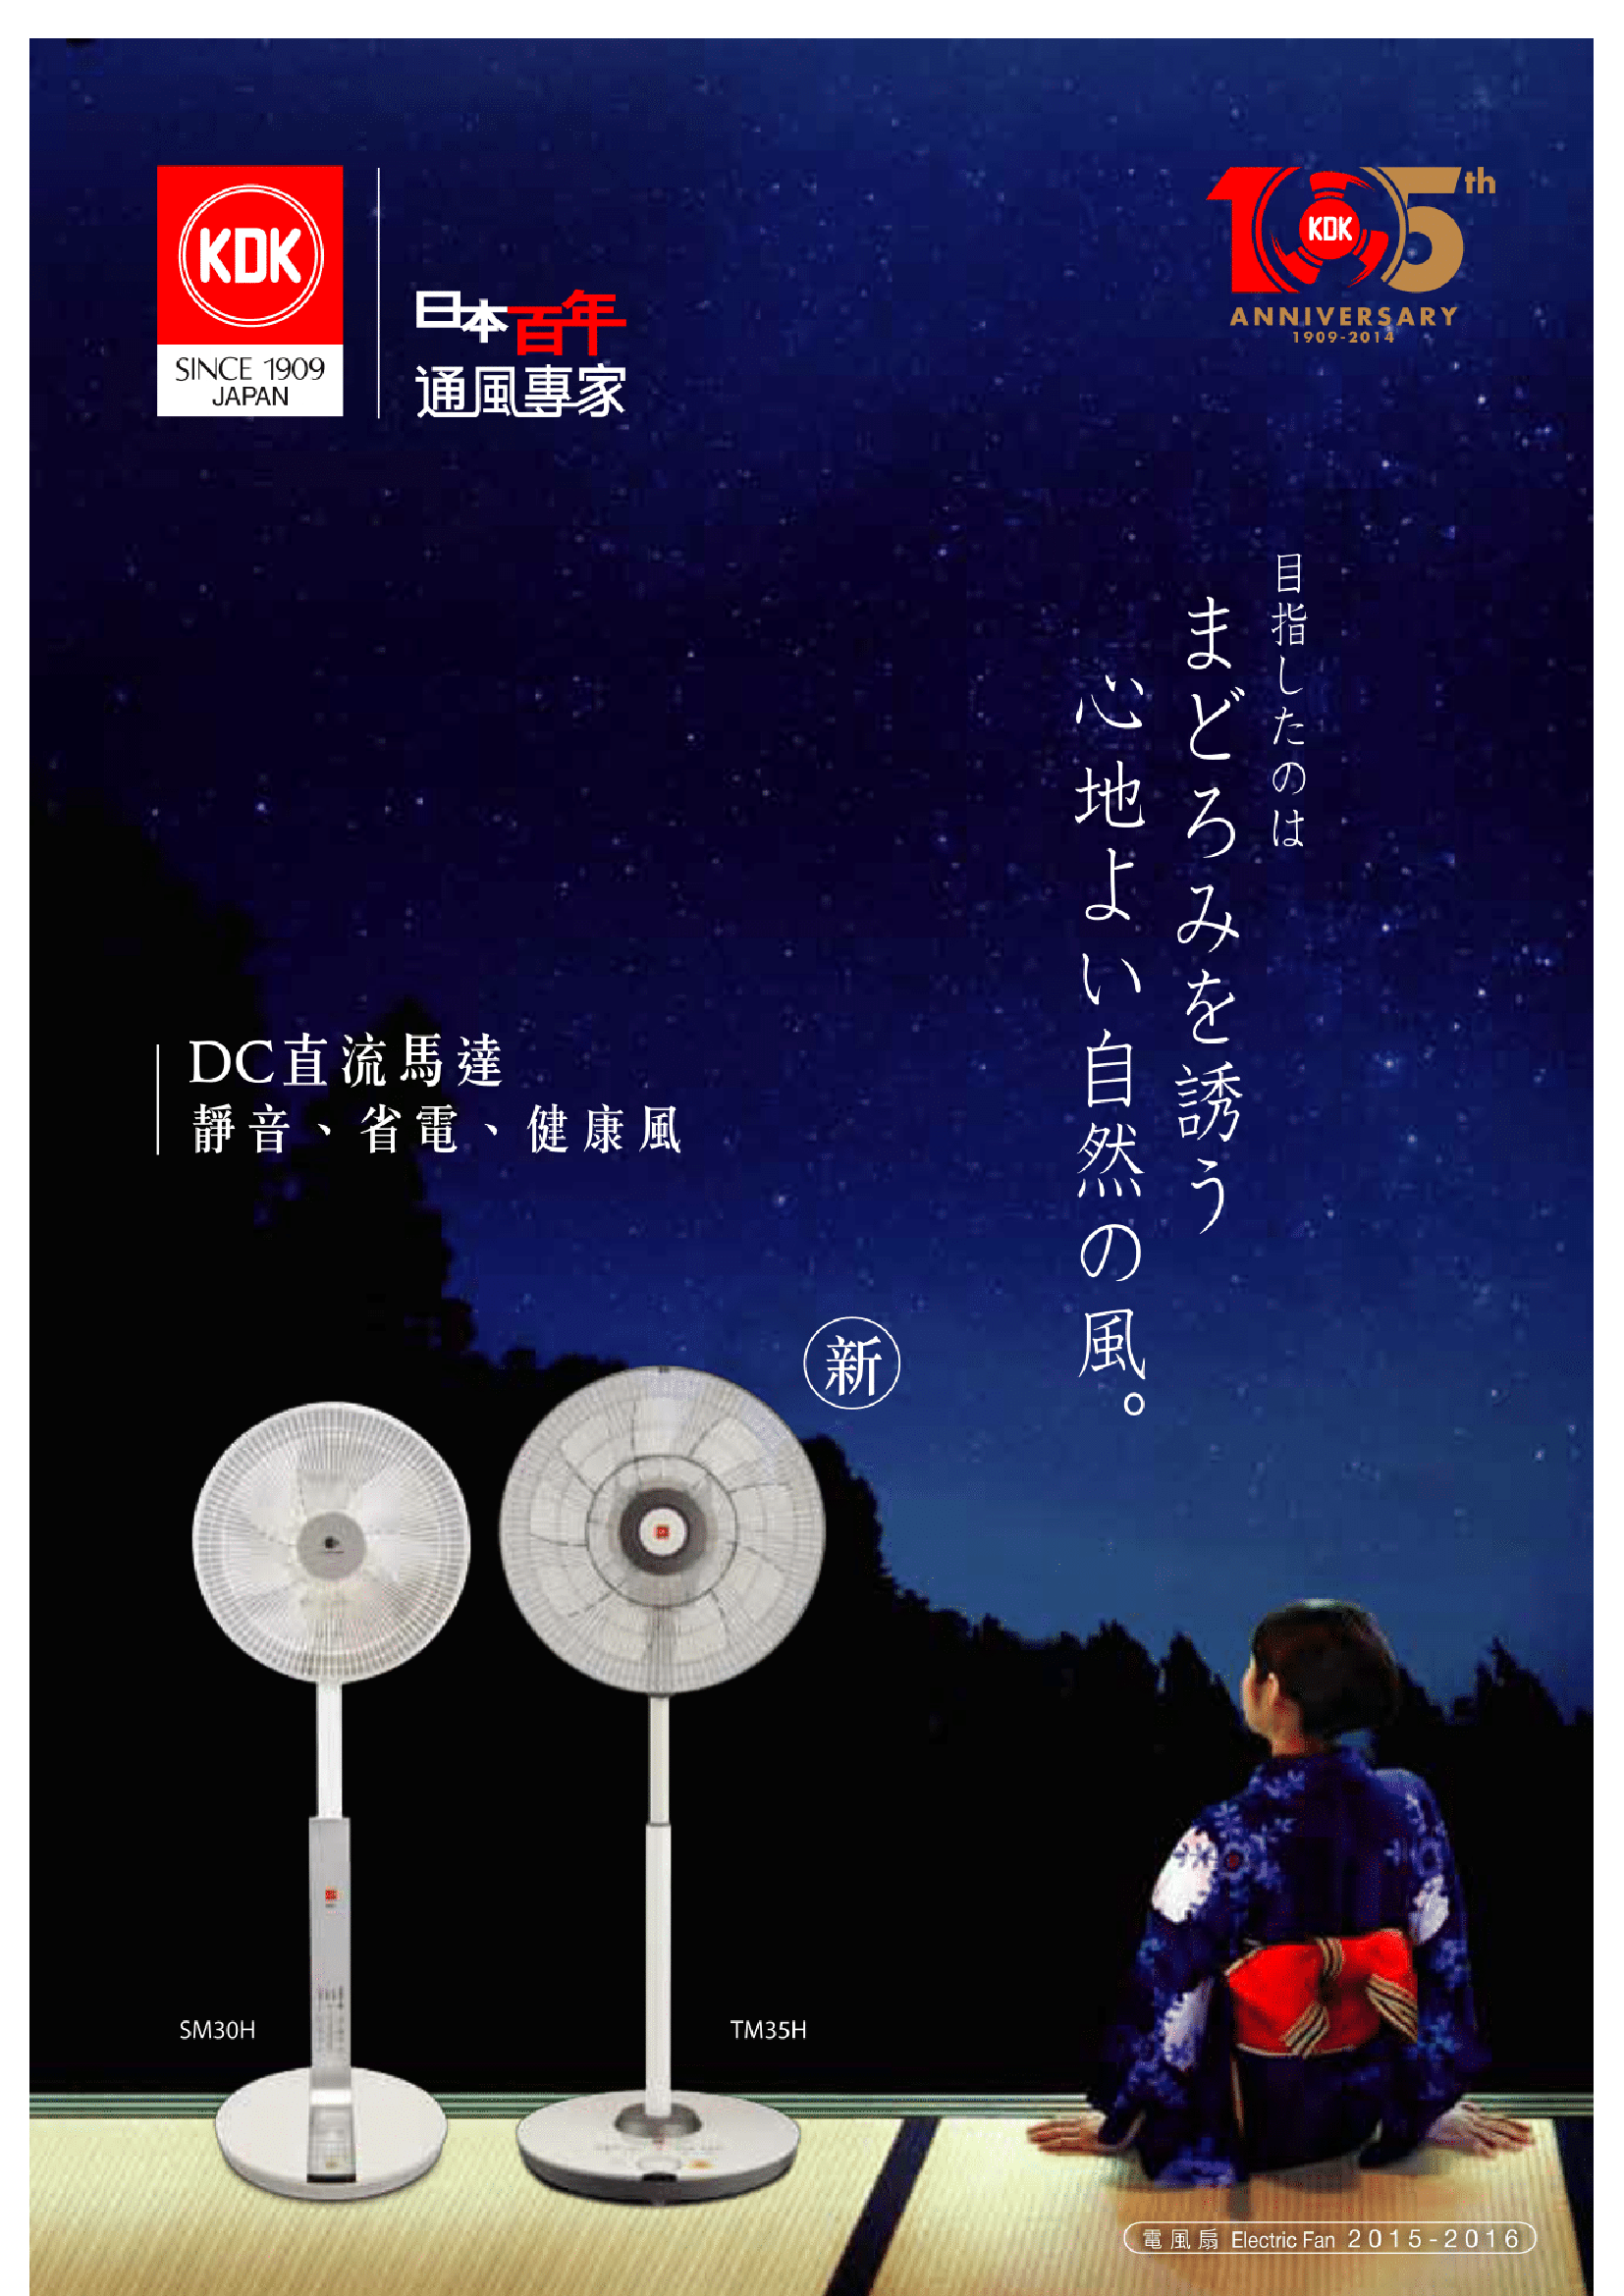 KDK Electric Fan Catalogue